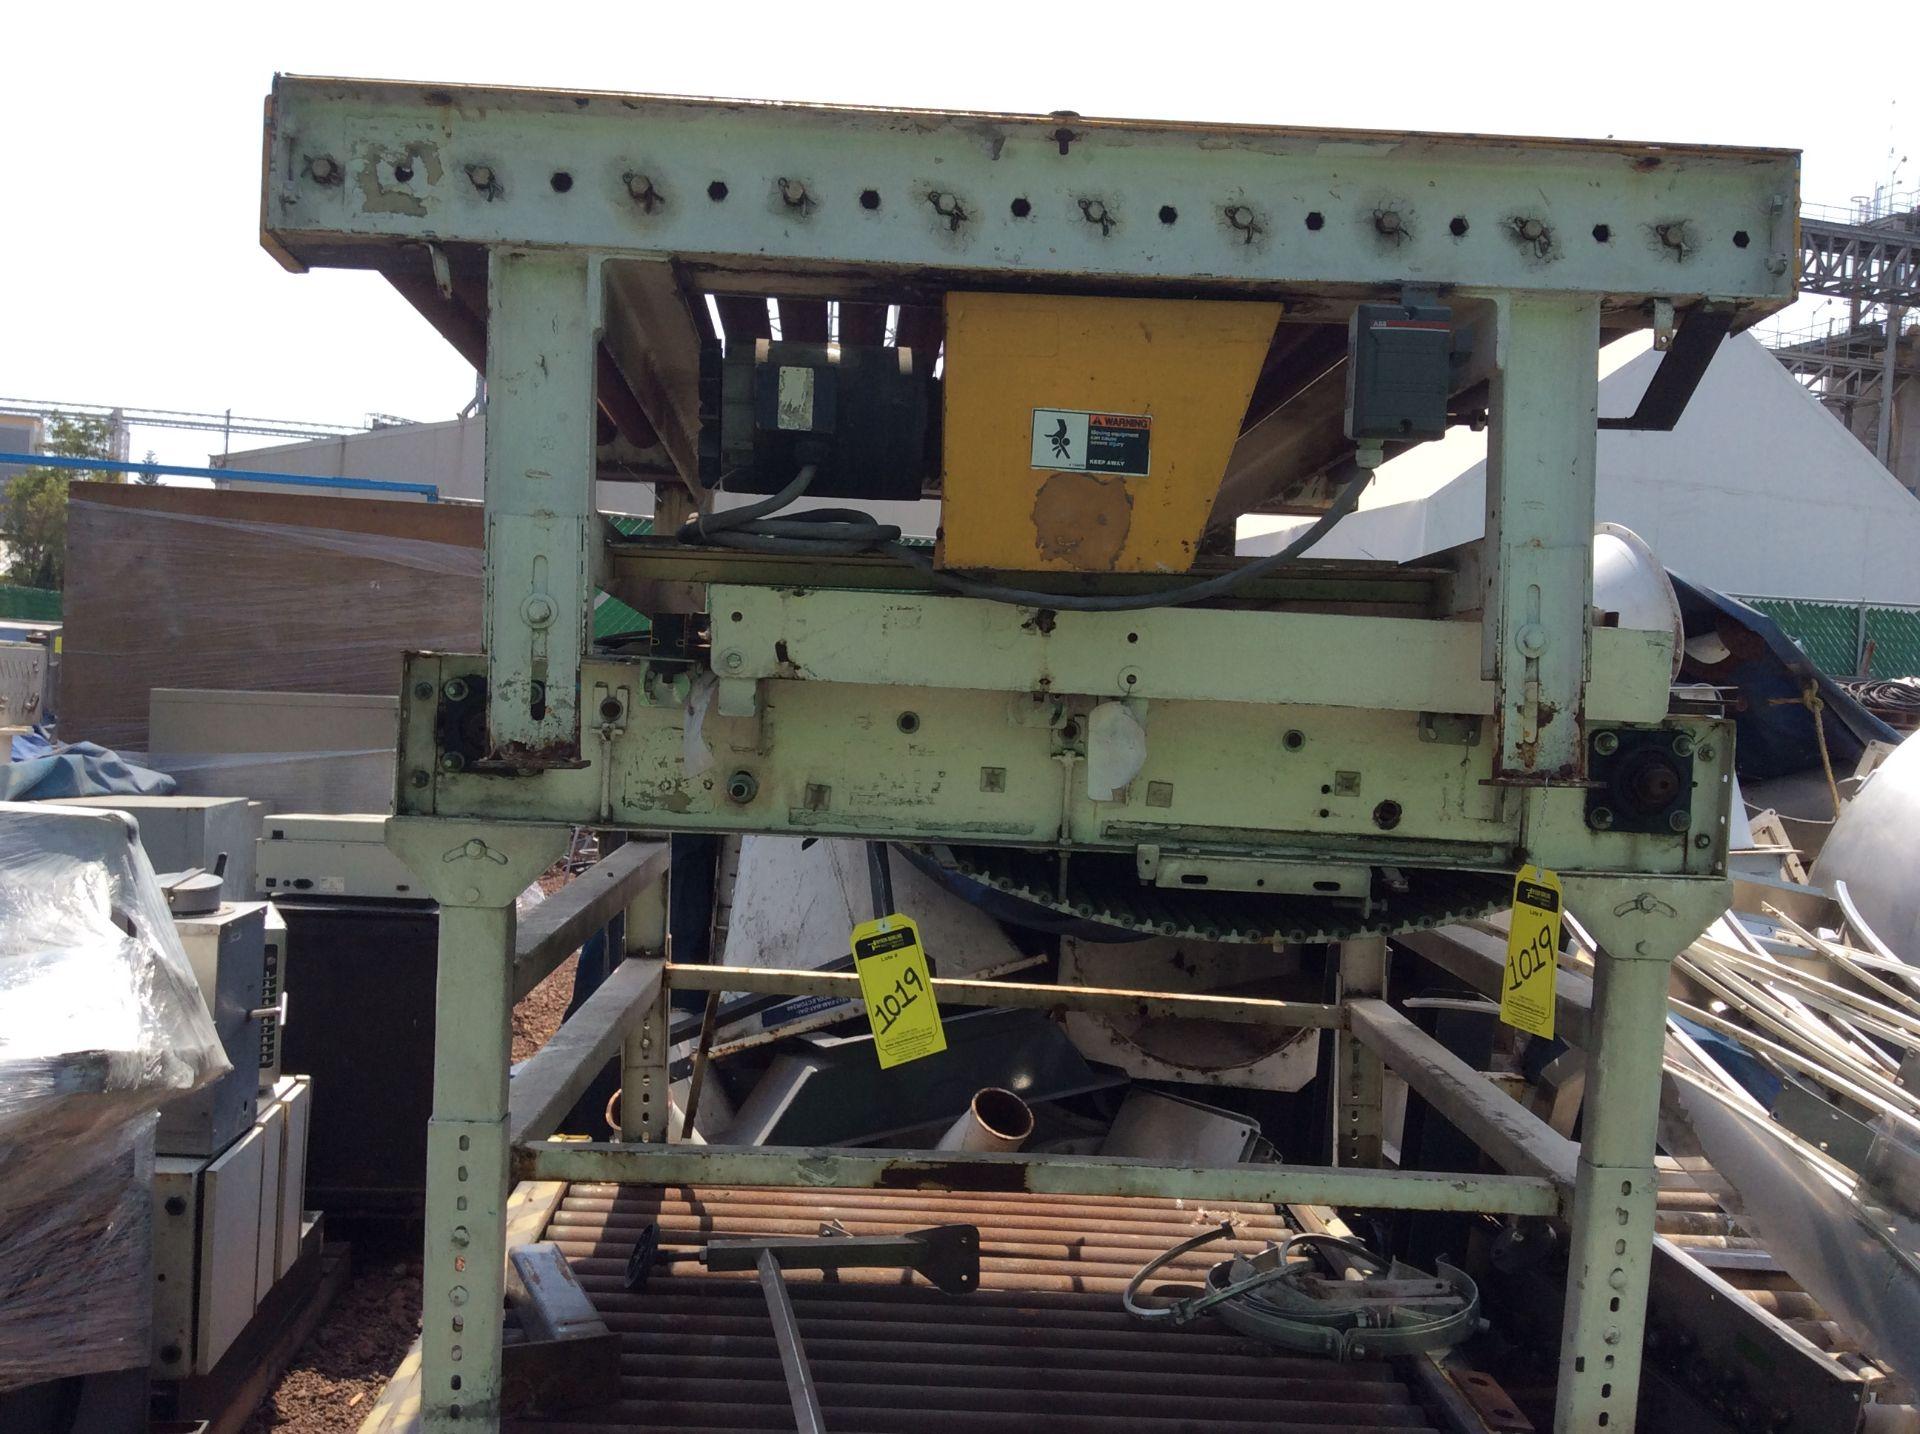 1 Roller conveyor, measures 1.37 x 1.50 x .67, 1 Conveyor measures 1.20 x 2.08x .65 - Image 2 of 8